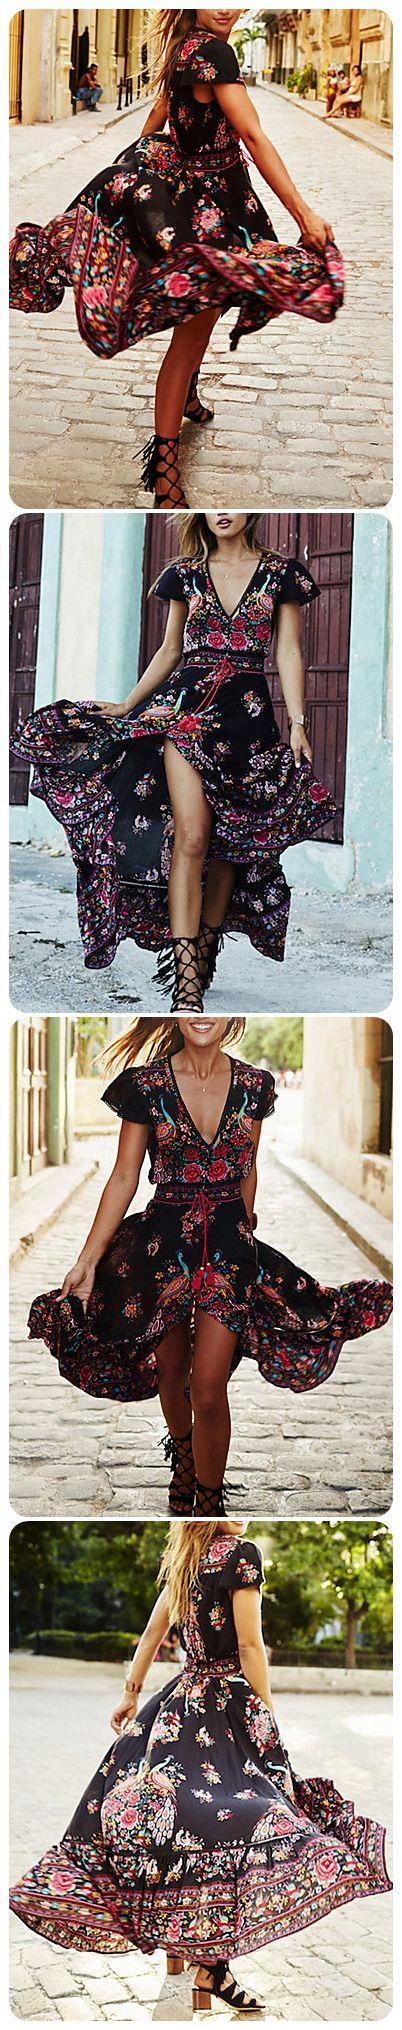 Womens Summer Vintage Boho Long Maxi Party Beach Dress Floral Sundress Black New